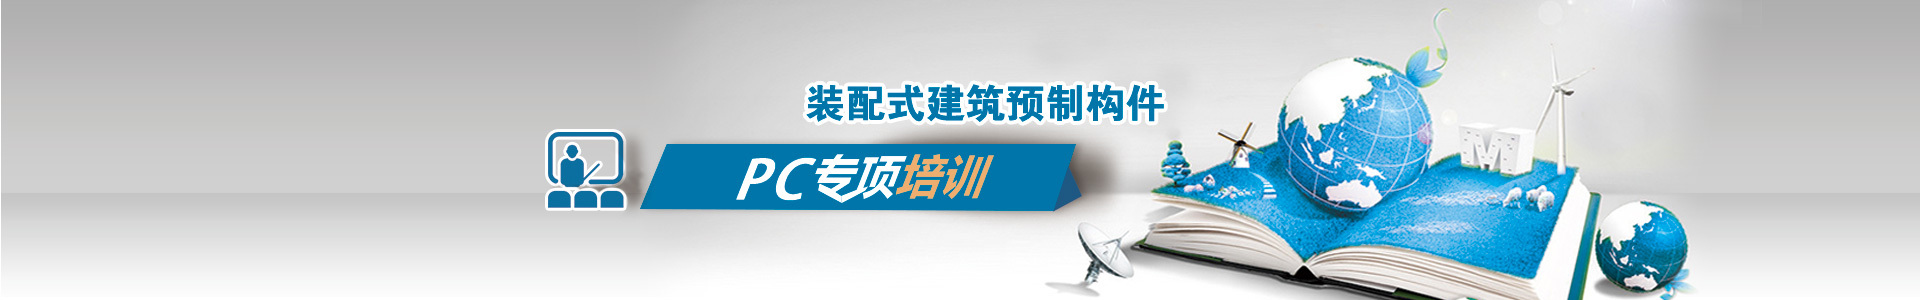 http://igreenbuy-zhaopc-public.oss-cn-shanghai.aliyuncs.com/common/zhaopcbanner%E5%9F%B9%E8%AE%AD.jpg